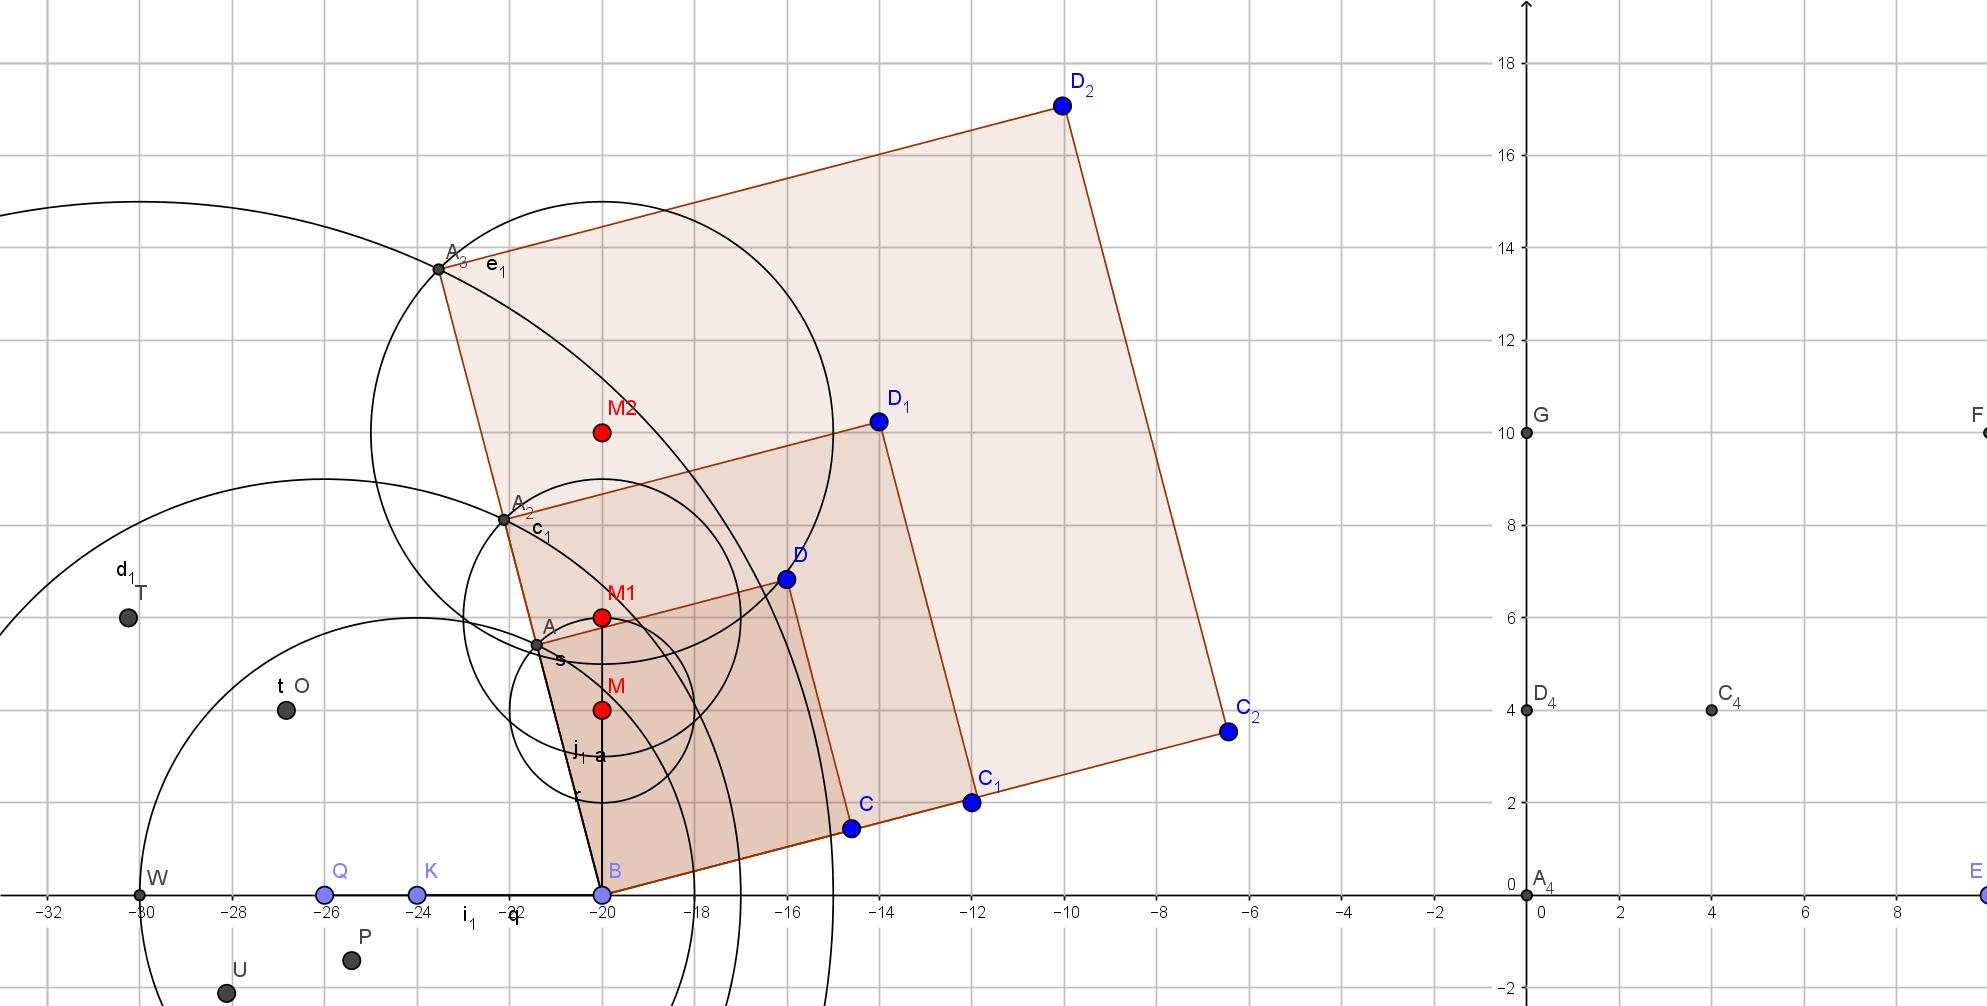 http://forum.matematika.cz/upload3/img/2017-04/64181_%25C4%258Dtverce%2Bnov%25C3%25A9.png